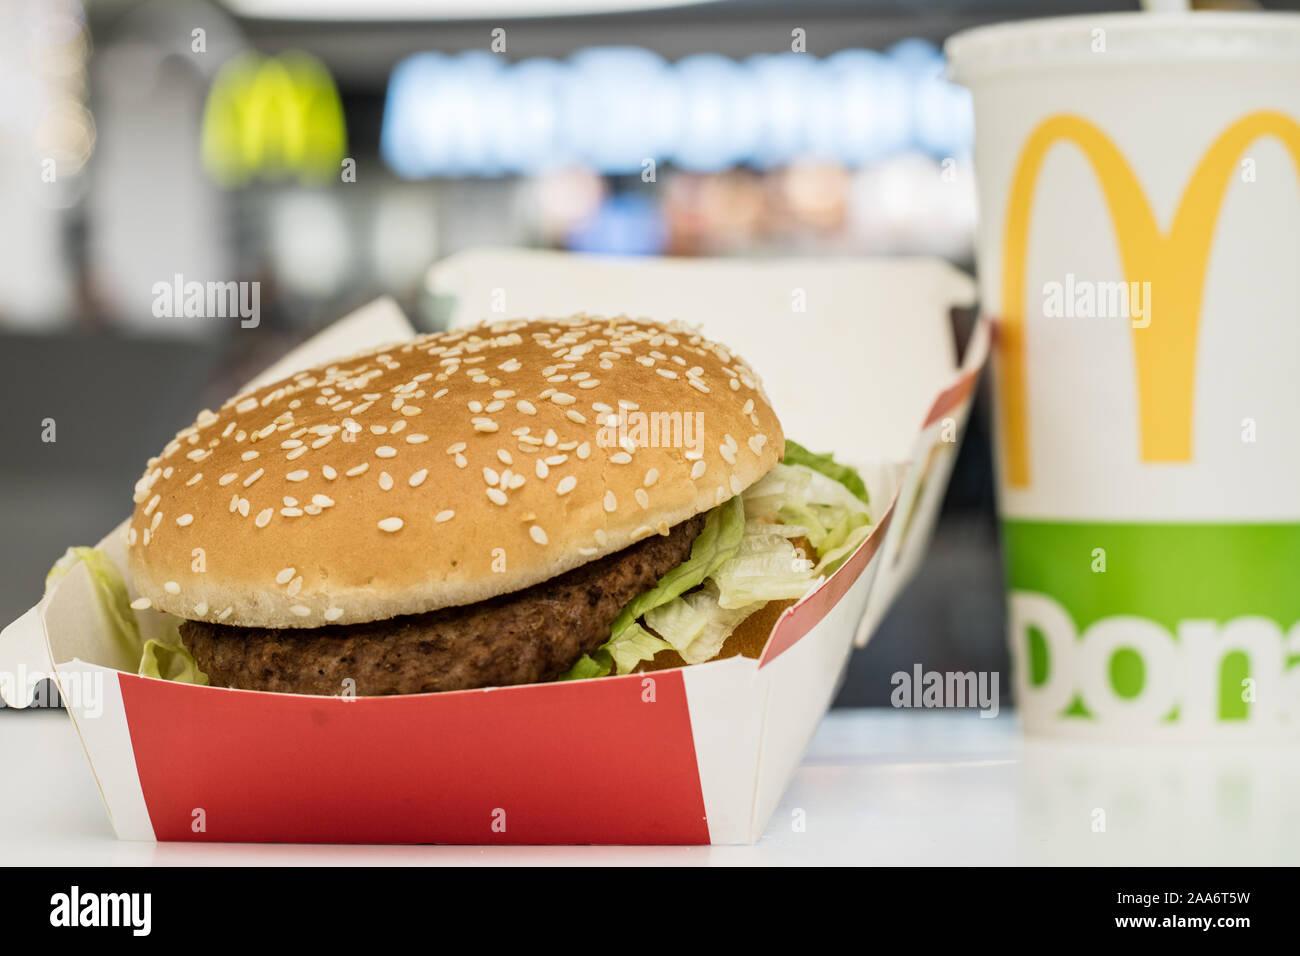 China Coke 2019 Mcdonalds Mcdonald/'s Big Mac Can